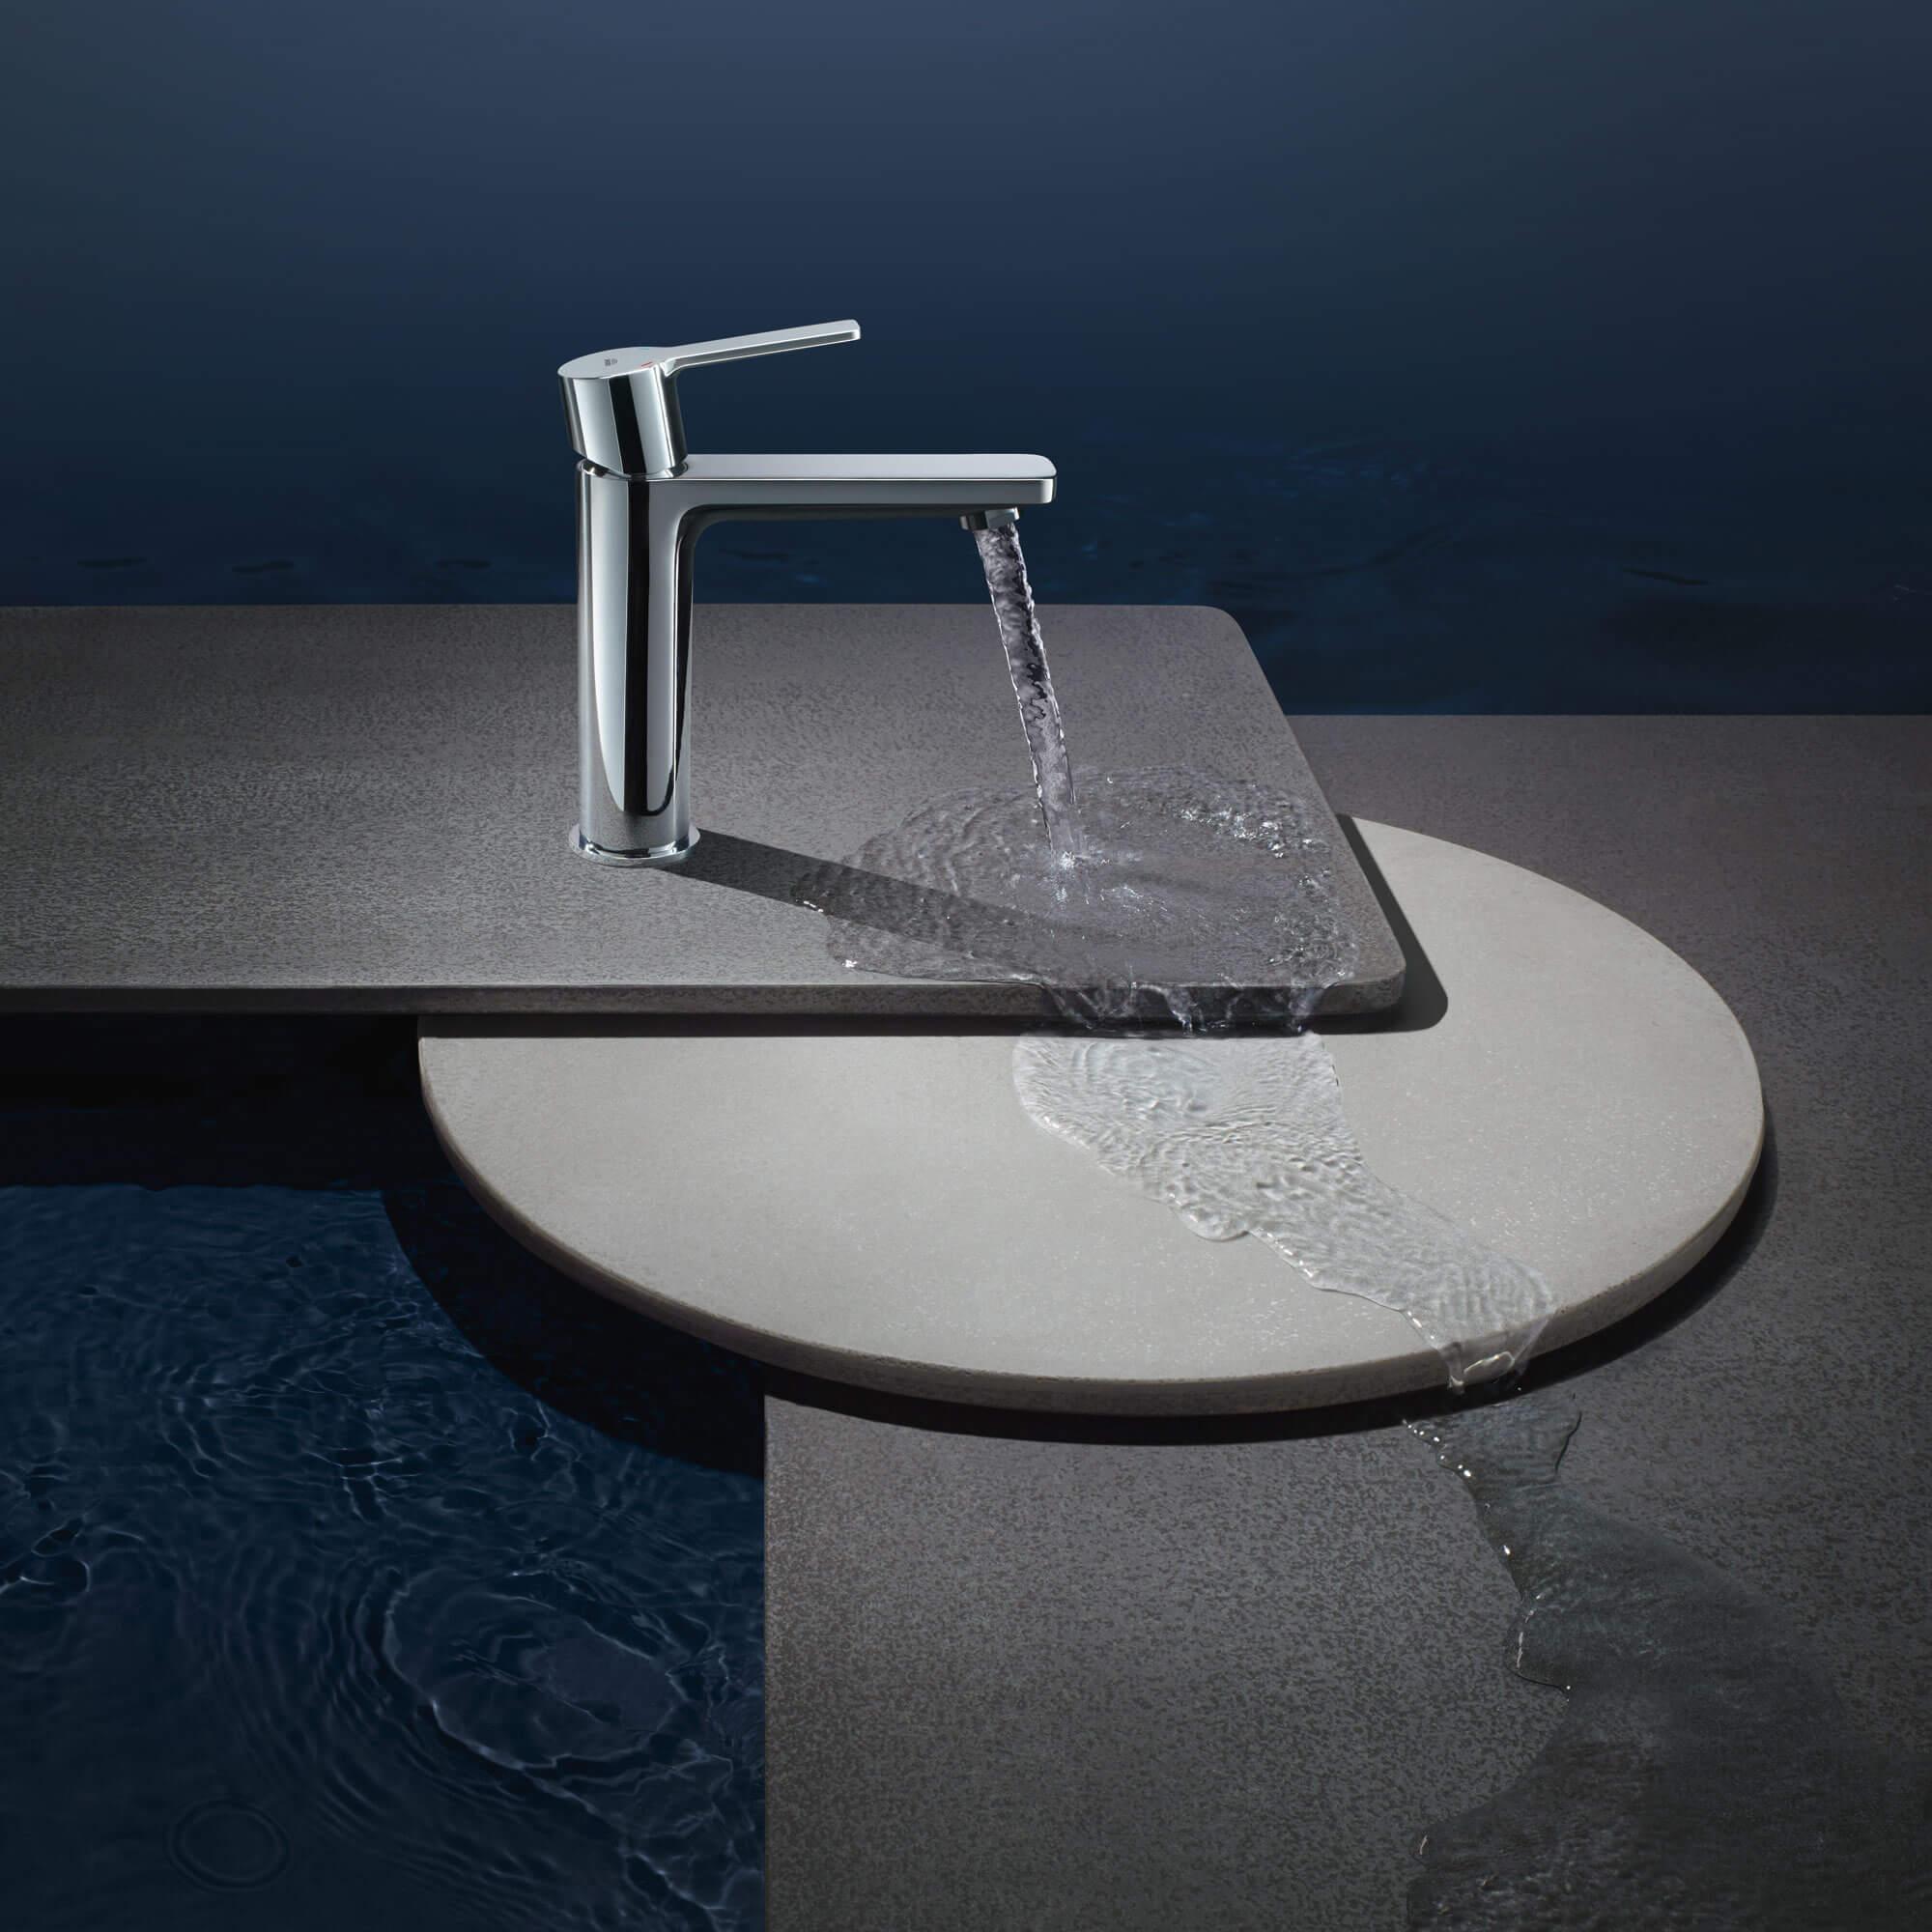 Lineare Faucet